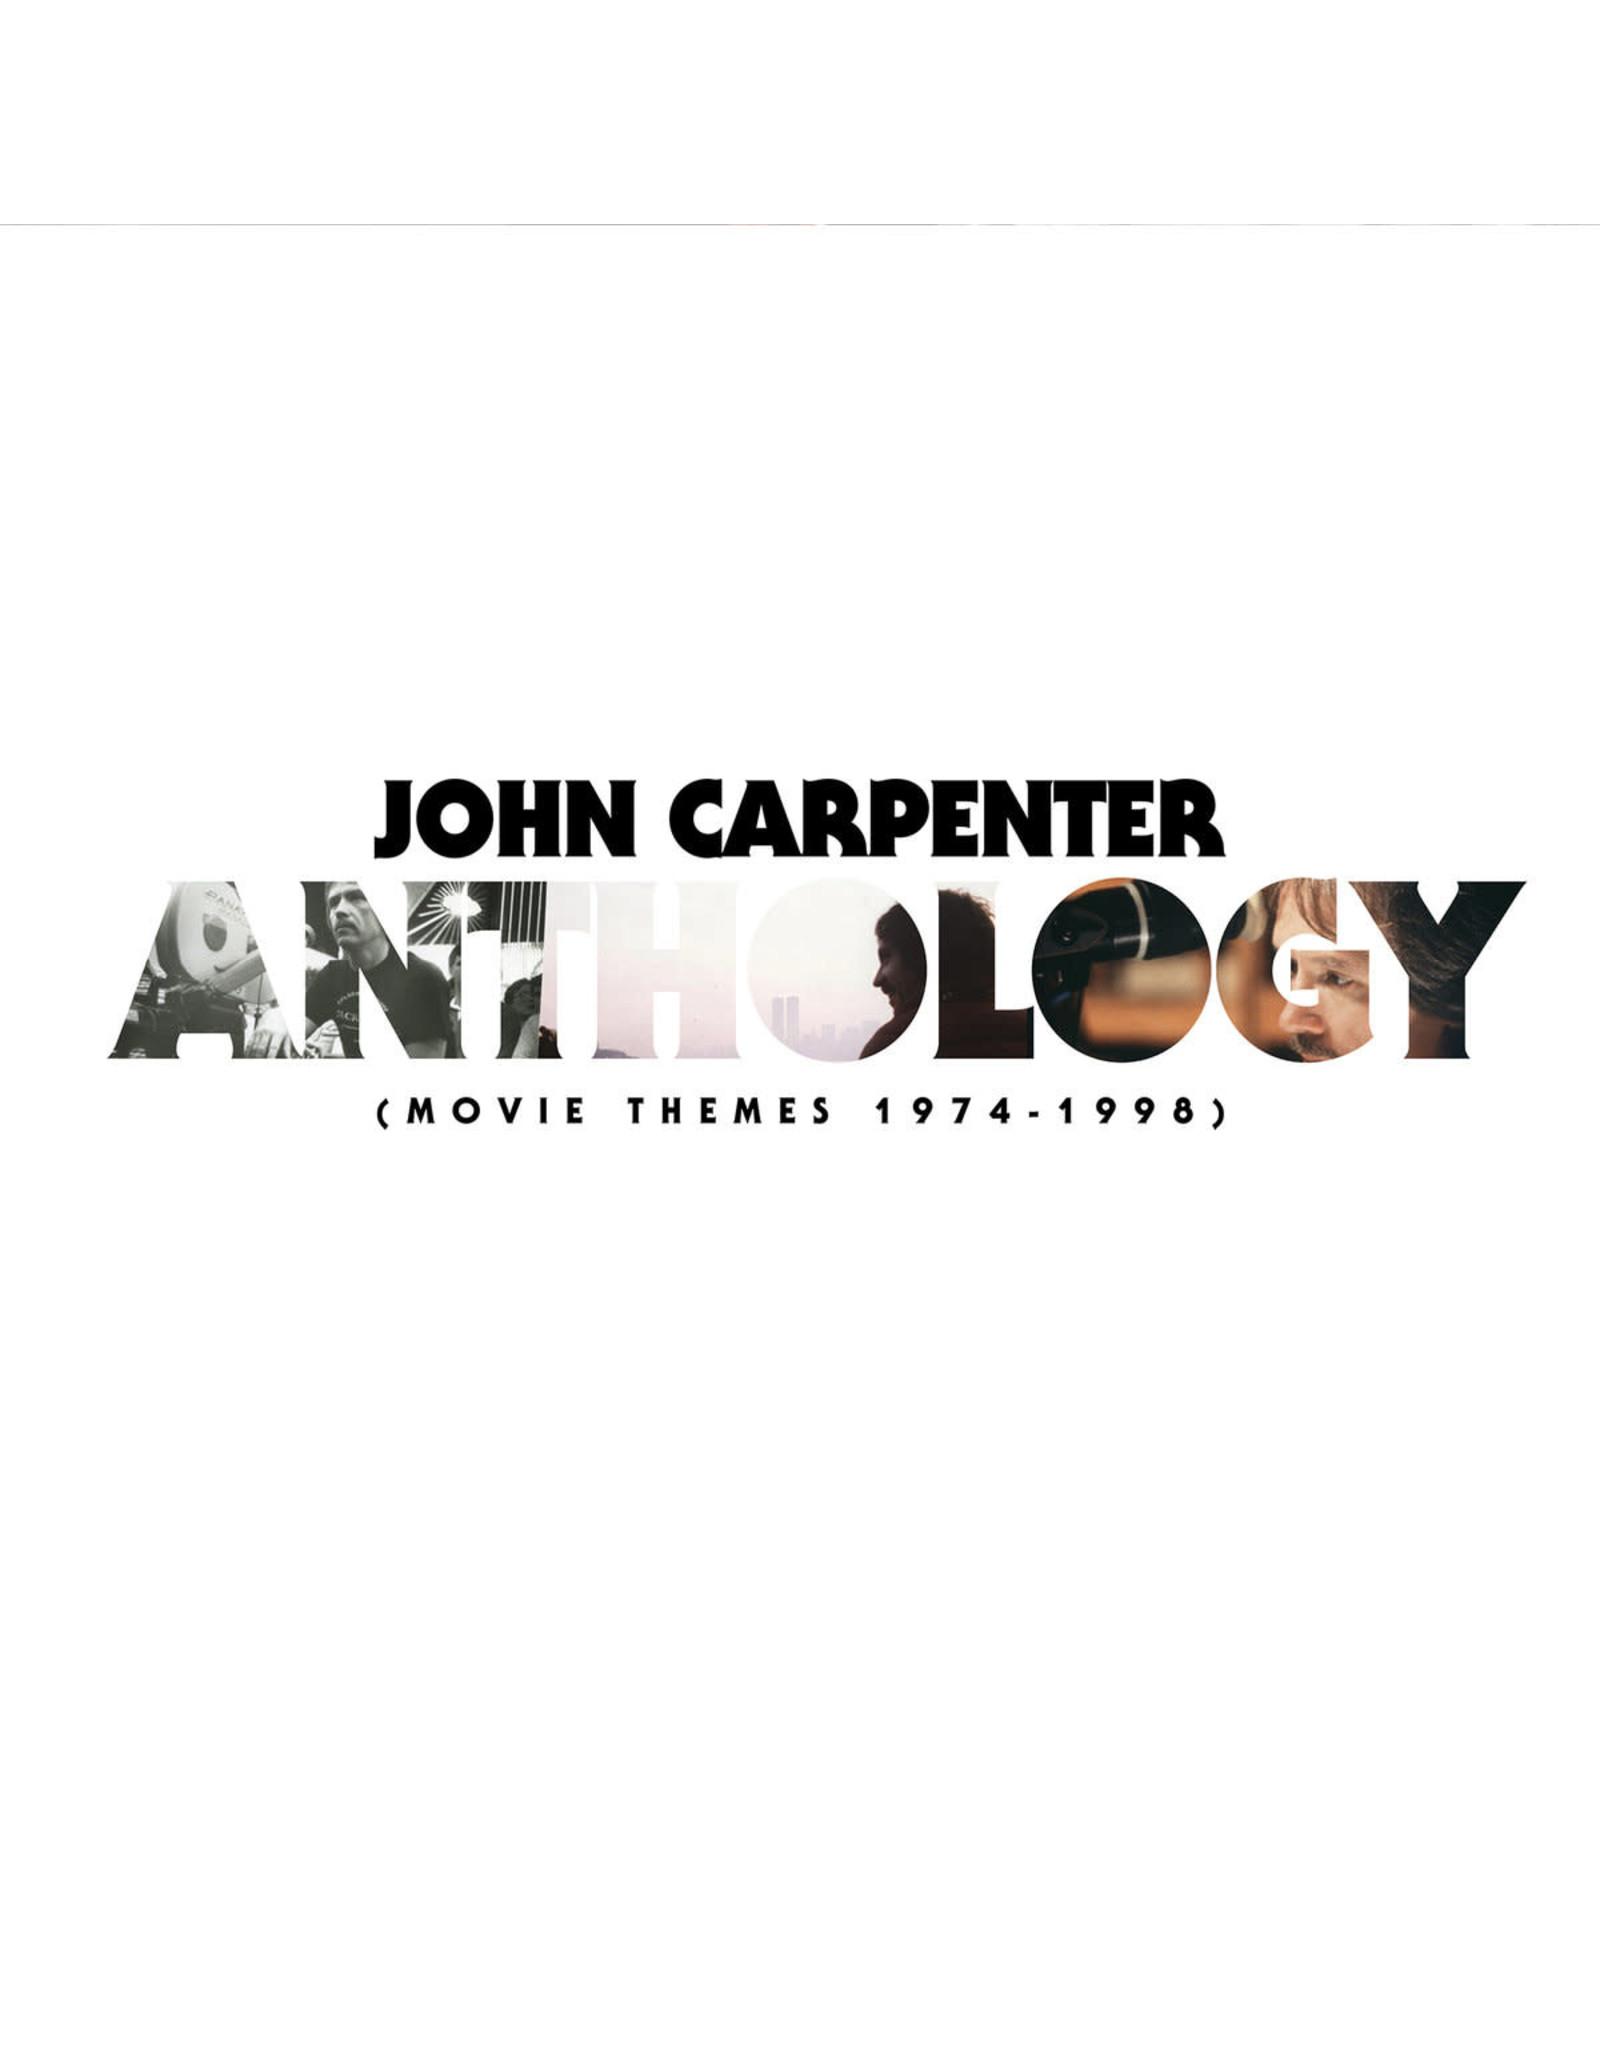 John Carpenter - Anthology (Movie Themes 1974- 1998)